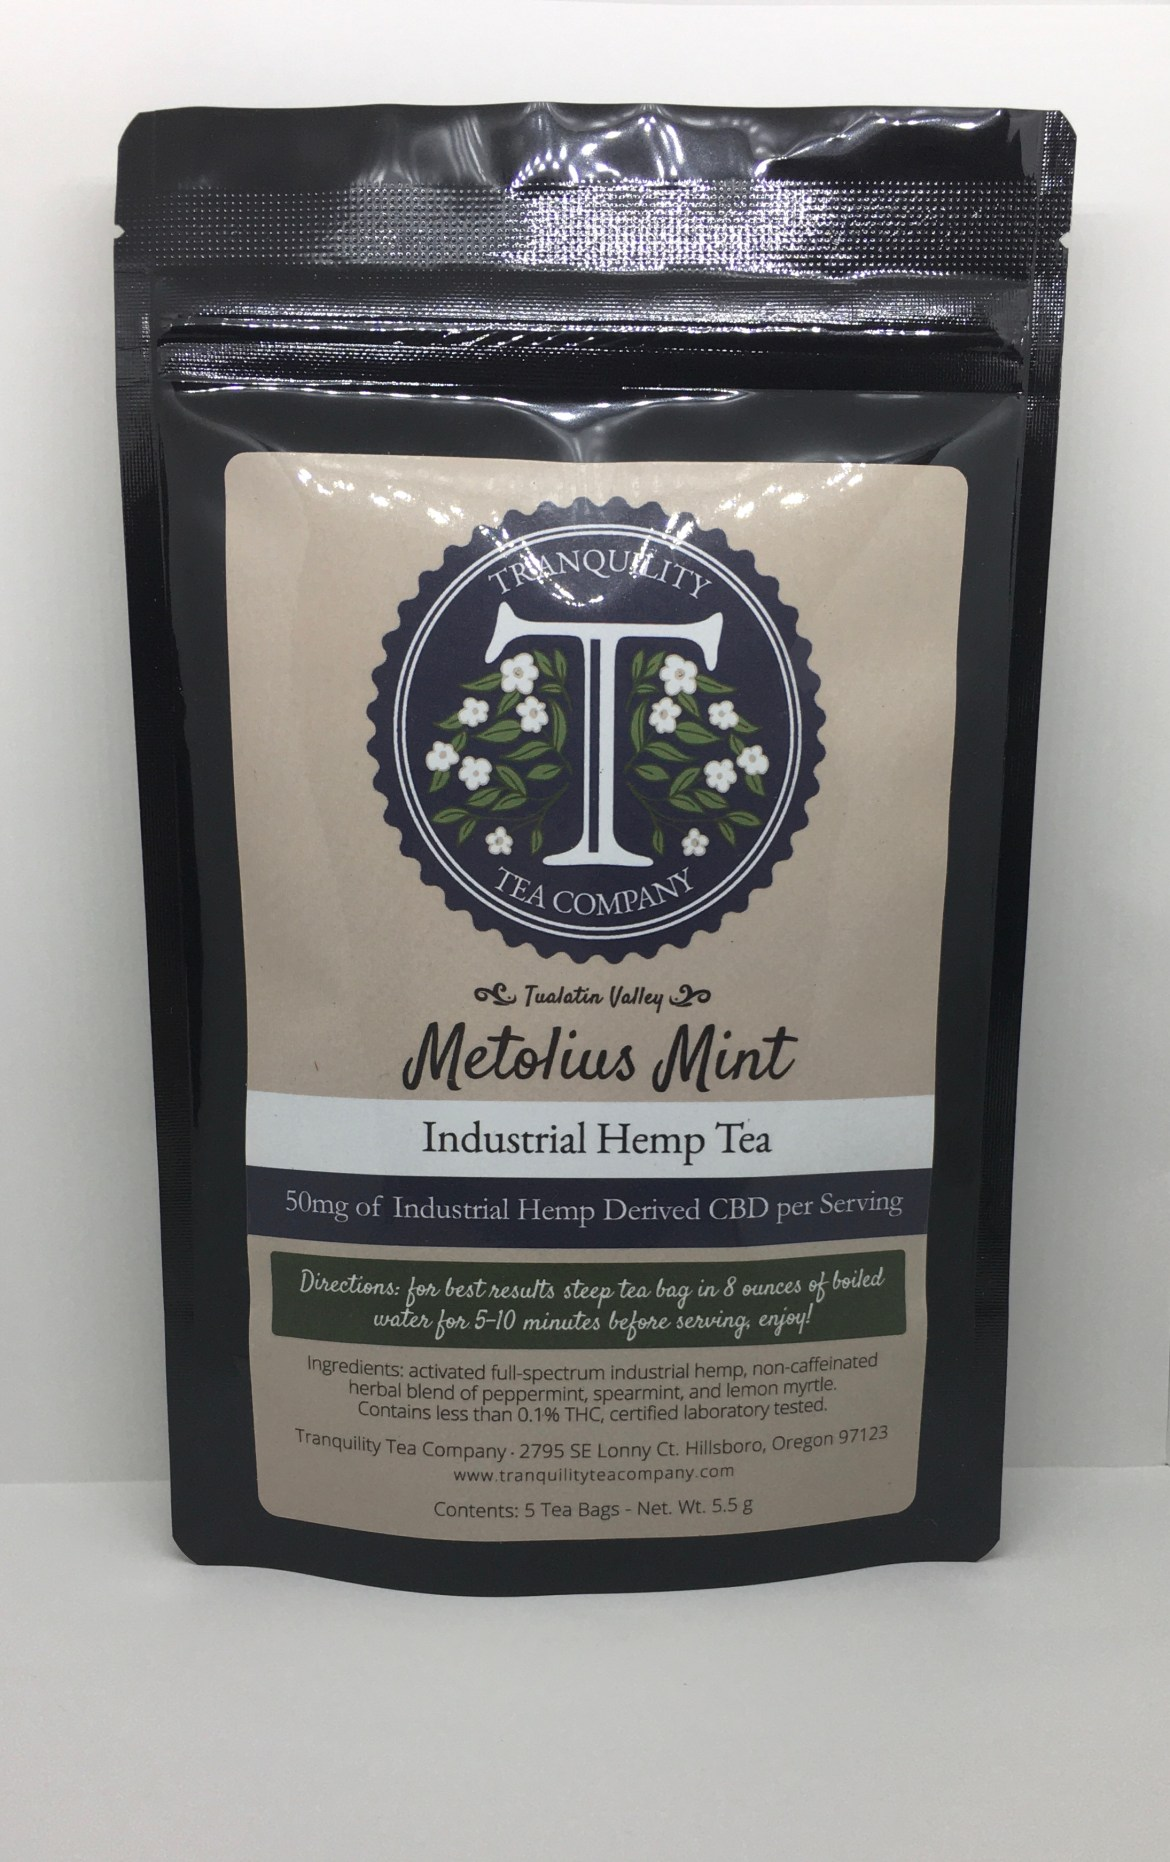 Tranquility Tea Company Metolius Mint